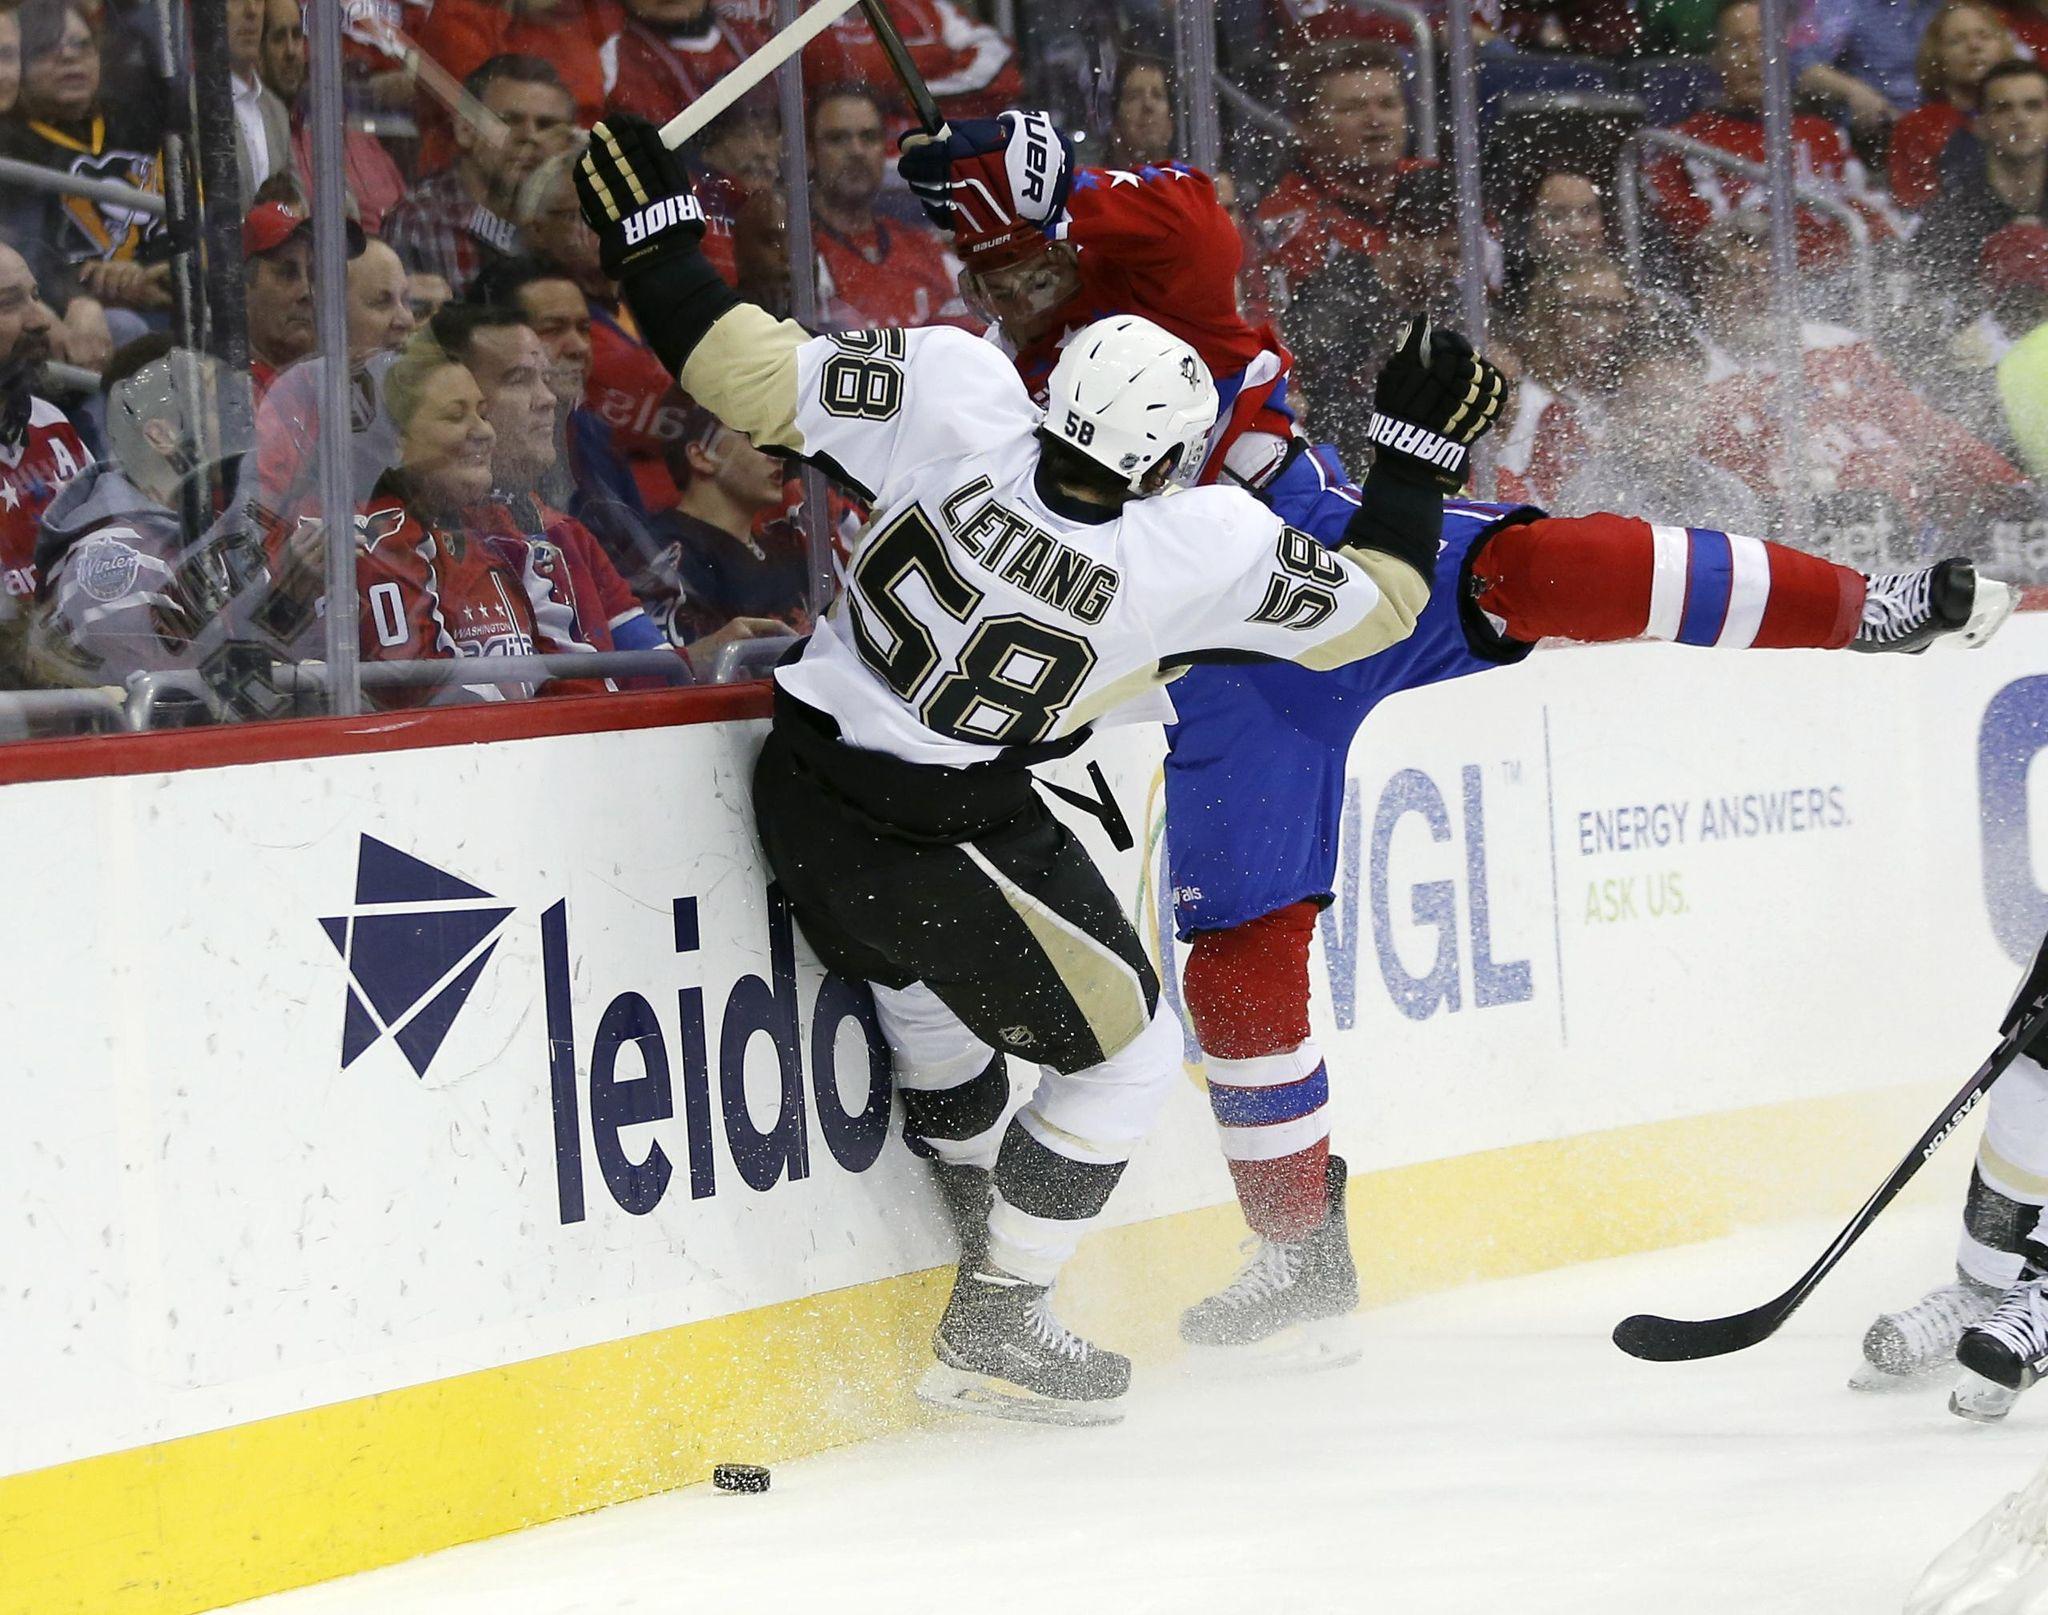 Penguins_capitals_hockey_88950_s2048x1615